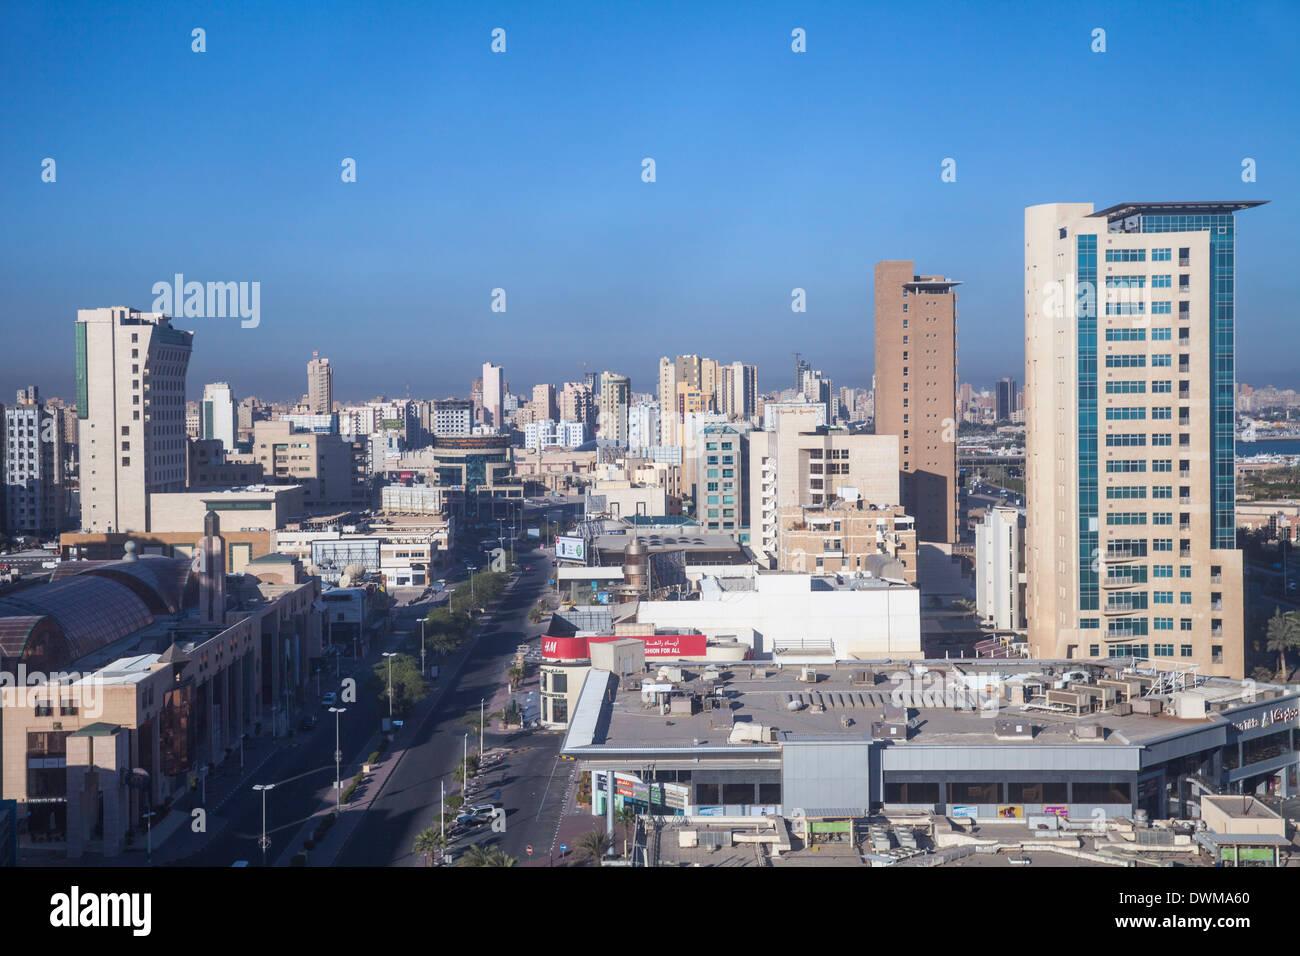 Salmiya, Kuwait-Stadt, Kuwait, Naher Osten Stockbild